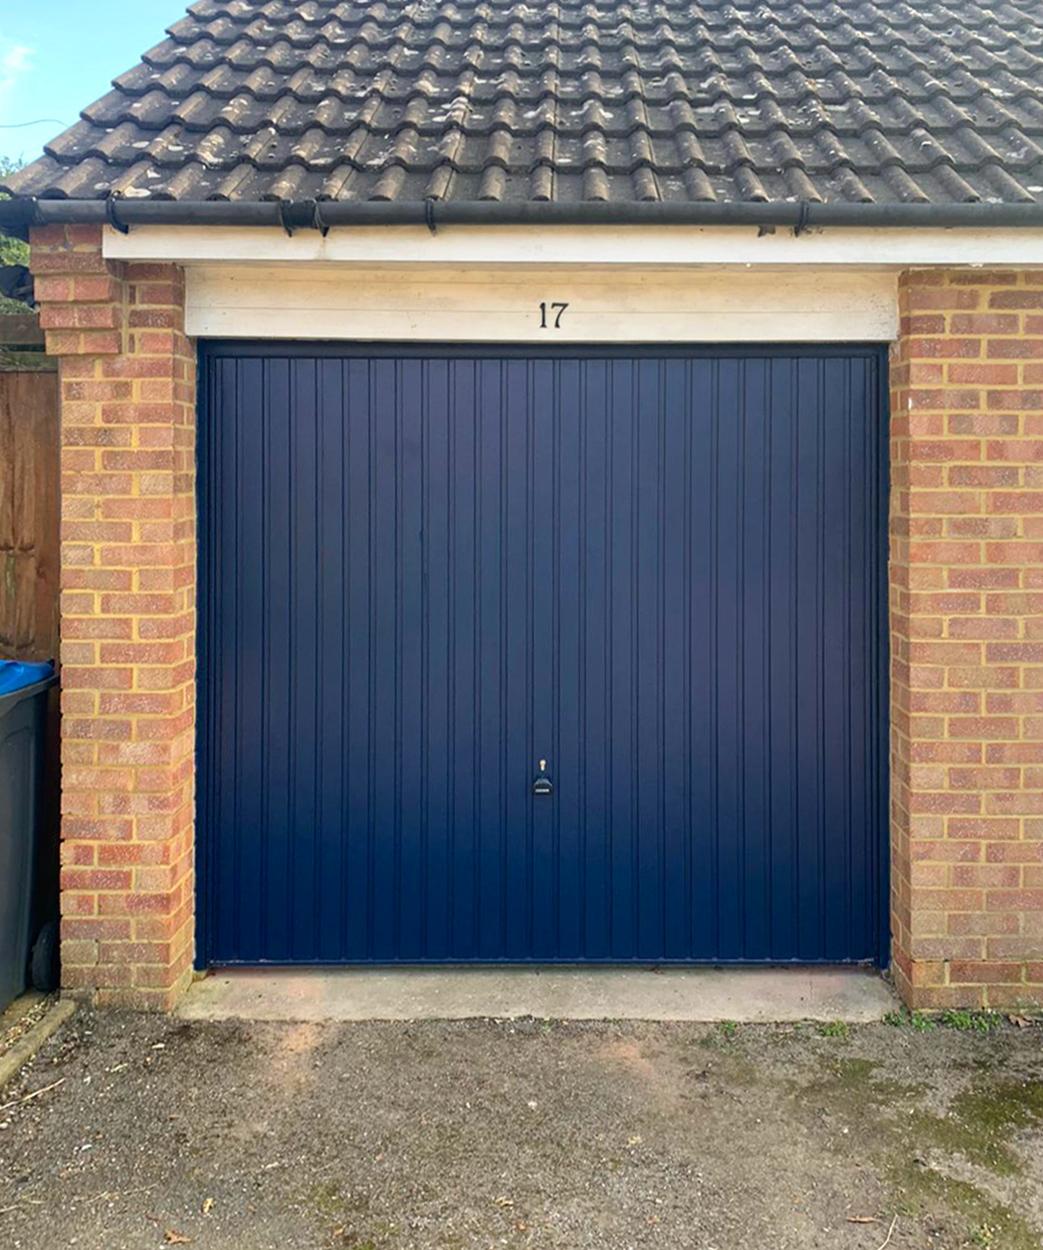 Garador Carlton Vertically Ribbed Canopy Up & Over Garage Door Finished in Steel Blue